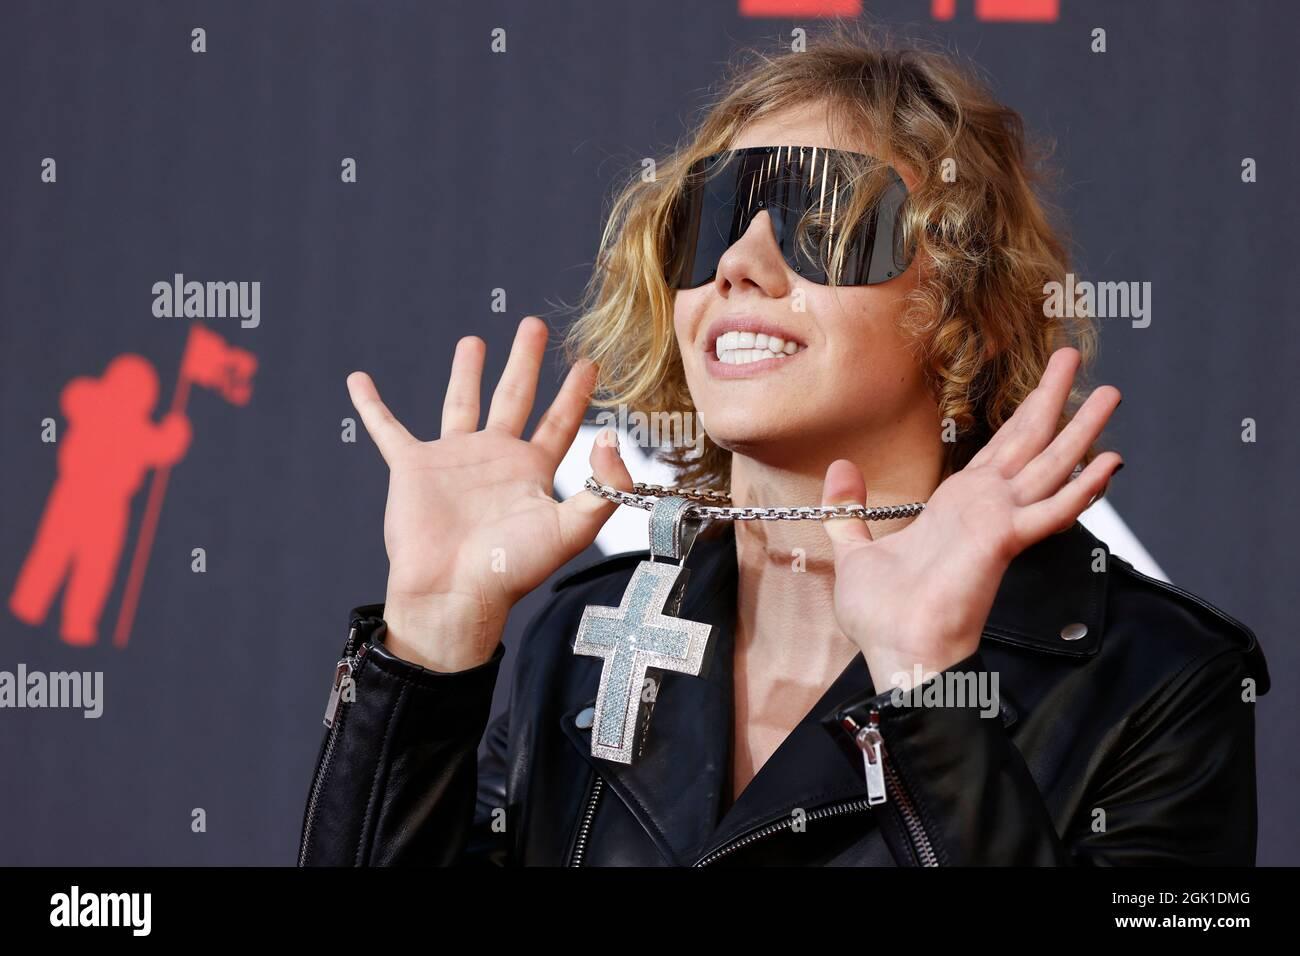 2021 MTV Video Music Awards - Arrivi - Barclays Center, Brooklyn, New York, USA, Settembre 12, 2021 - il Kid Laroi. REUTERS/Andrew Kelly Foto Stock